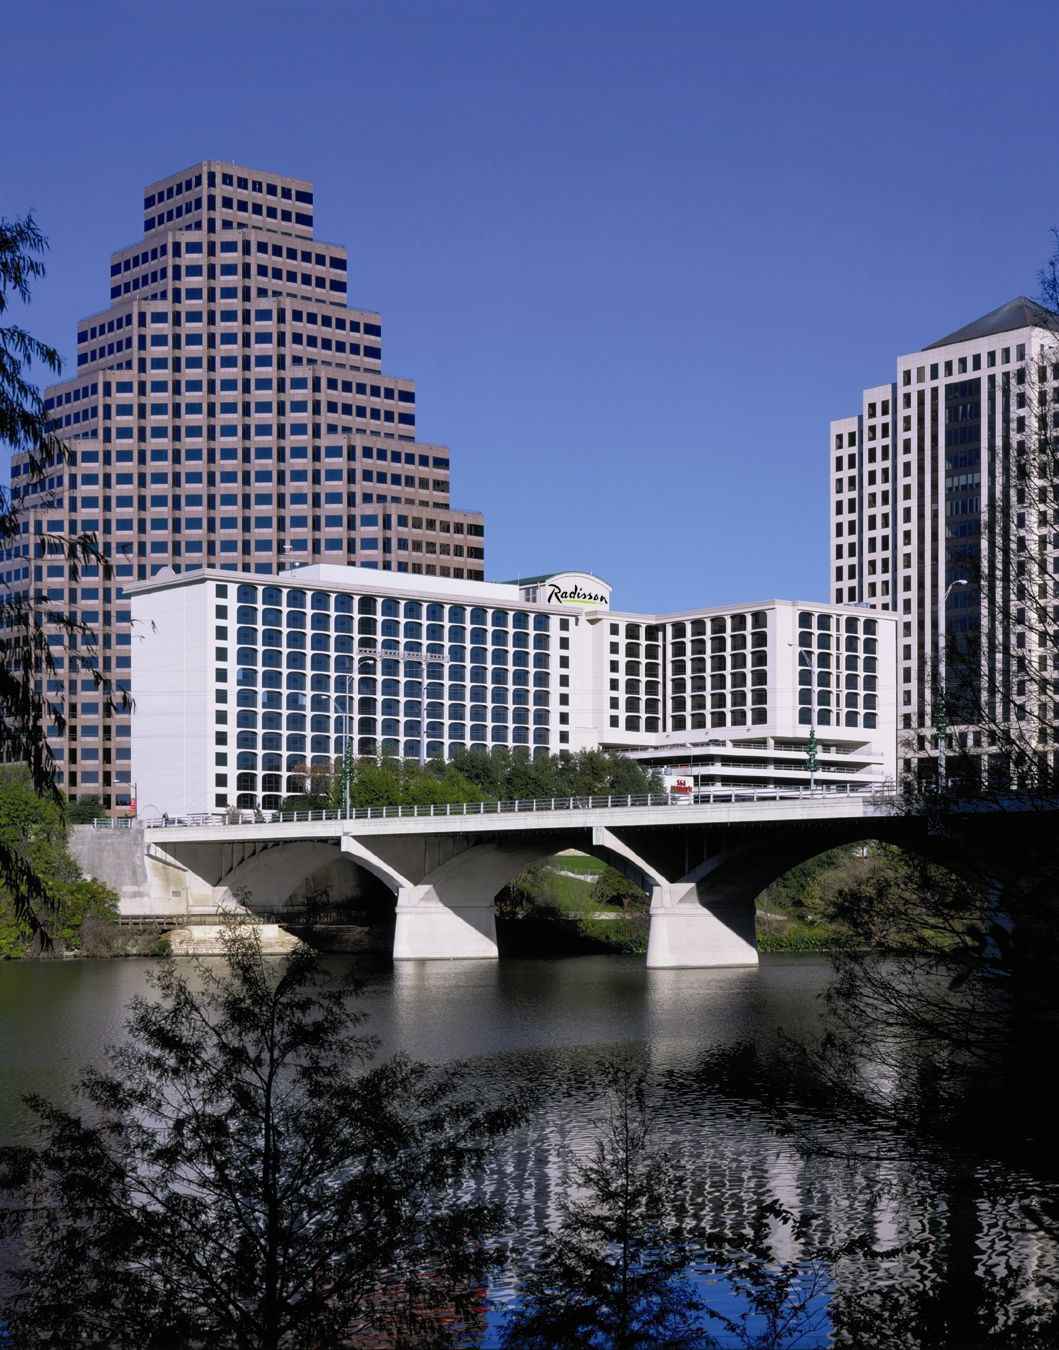 Hotel Radisson Austin Texas